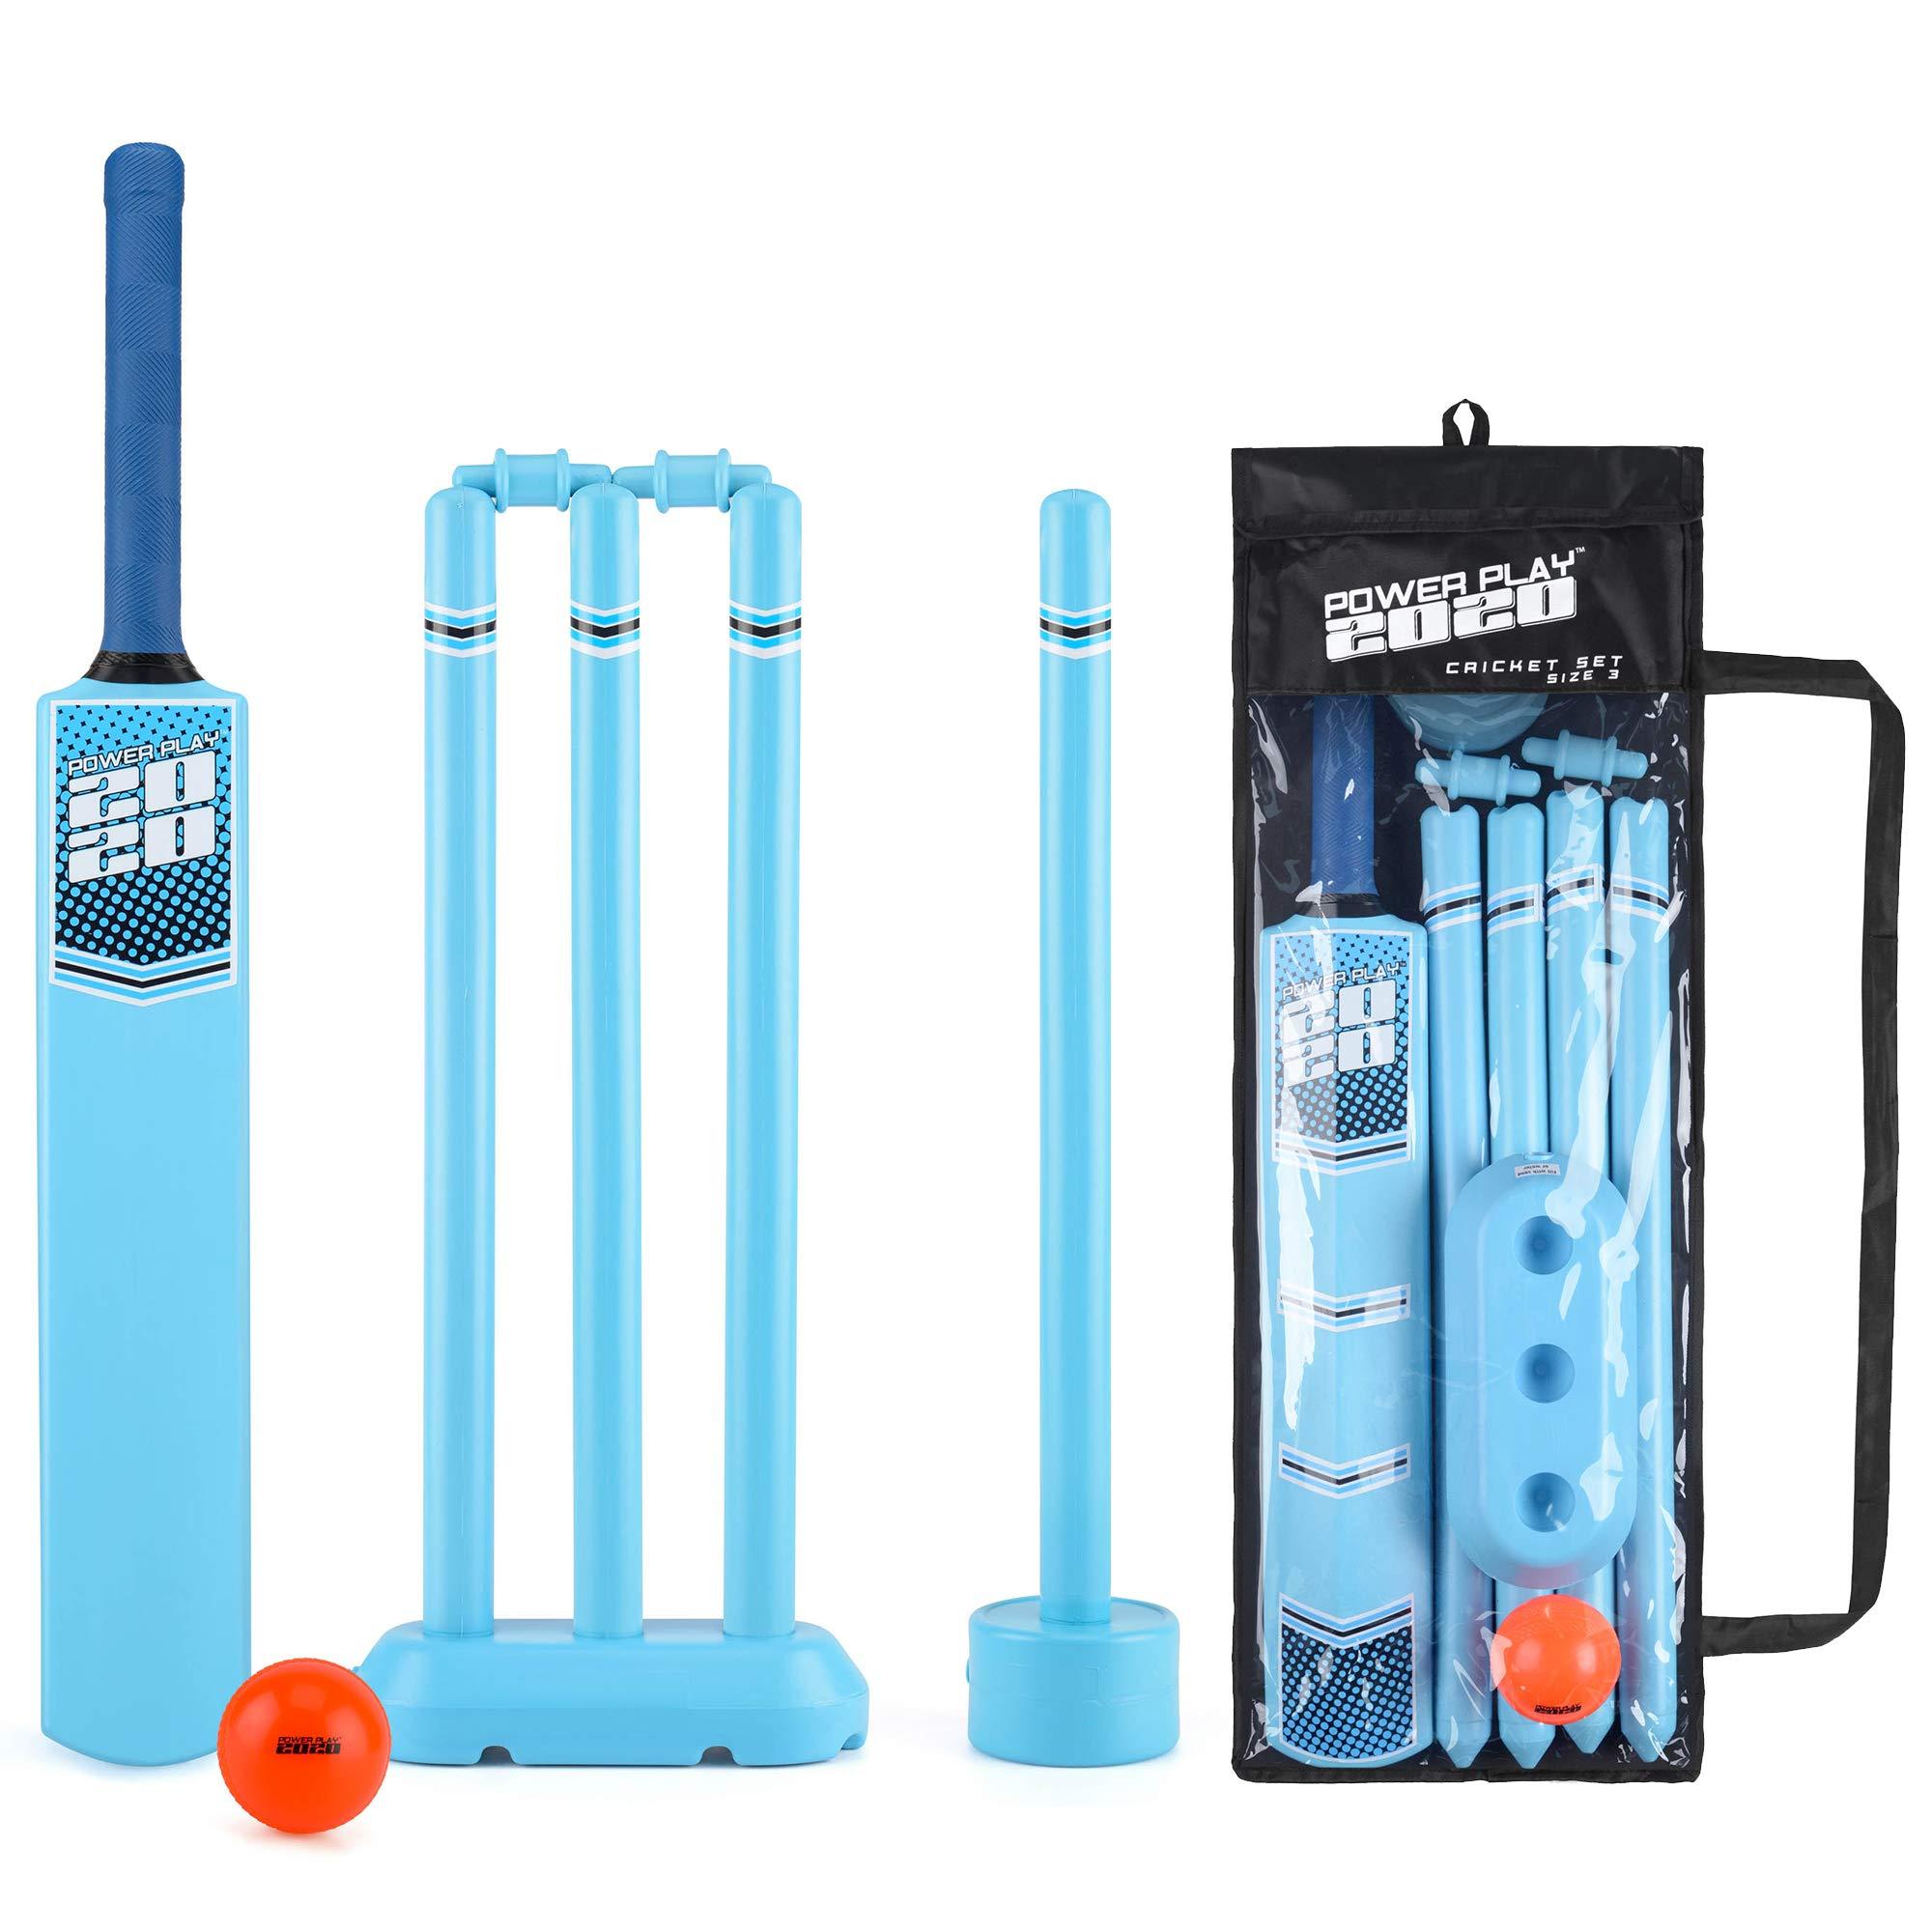 Cricket Set Bat Stumps Ball Bag Gray-Nicolls Powerplay Plastic Garden Beach